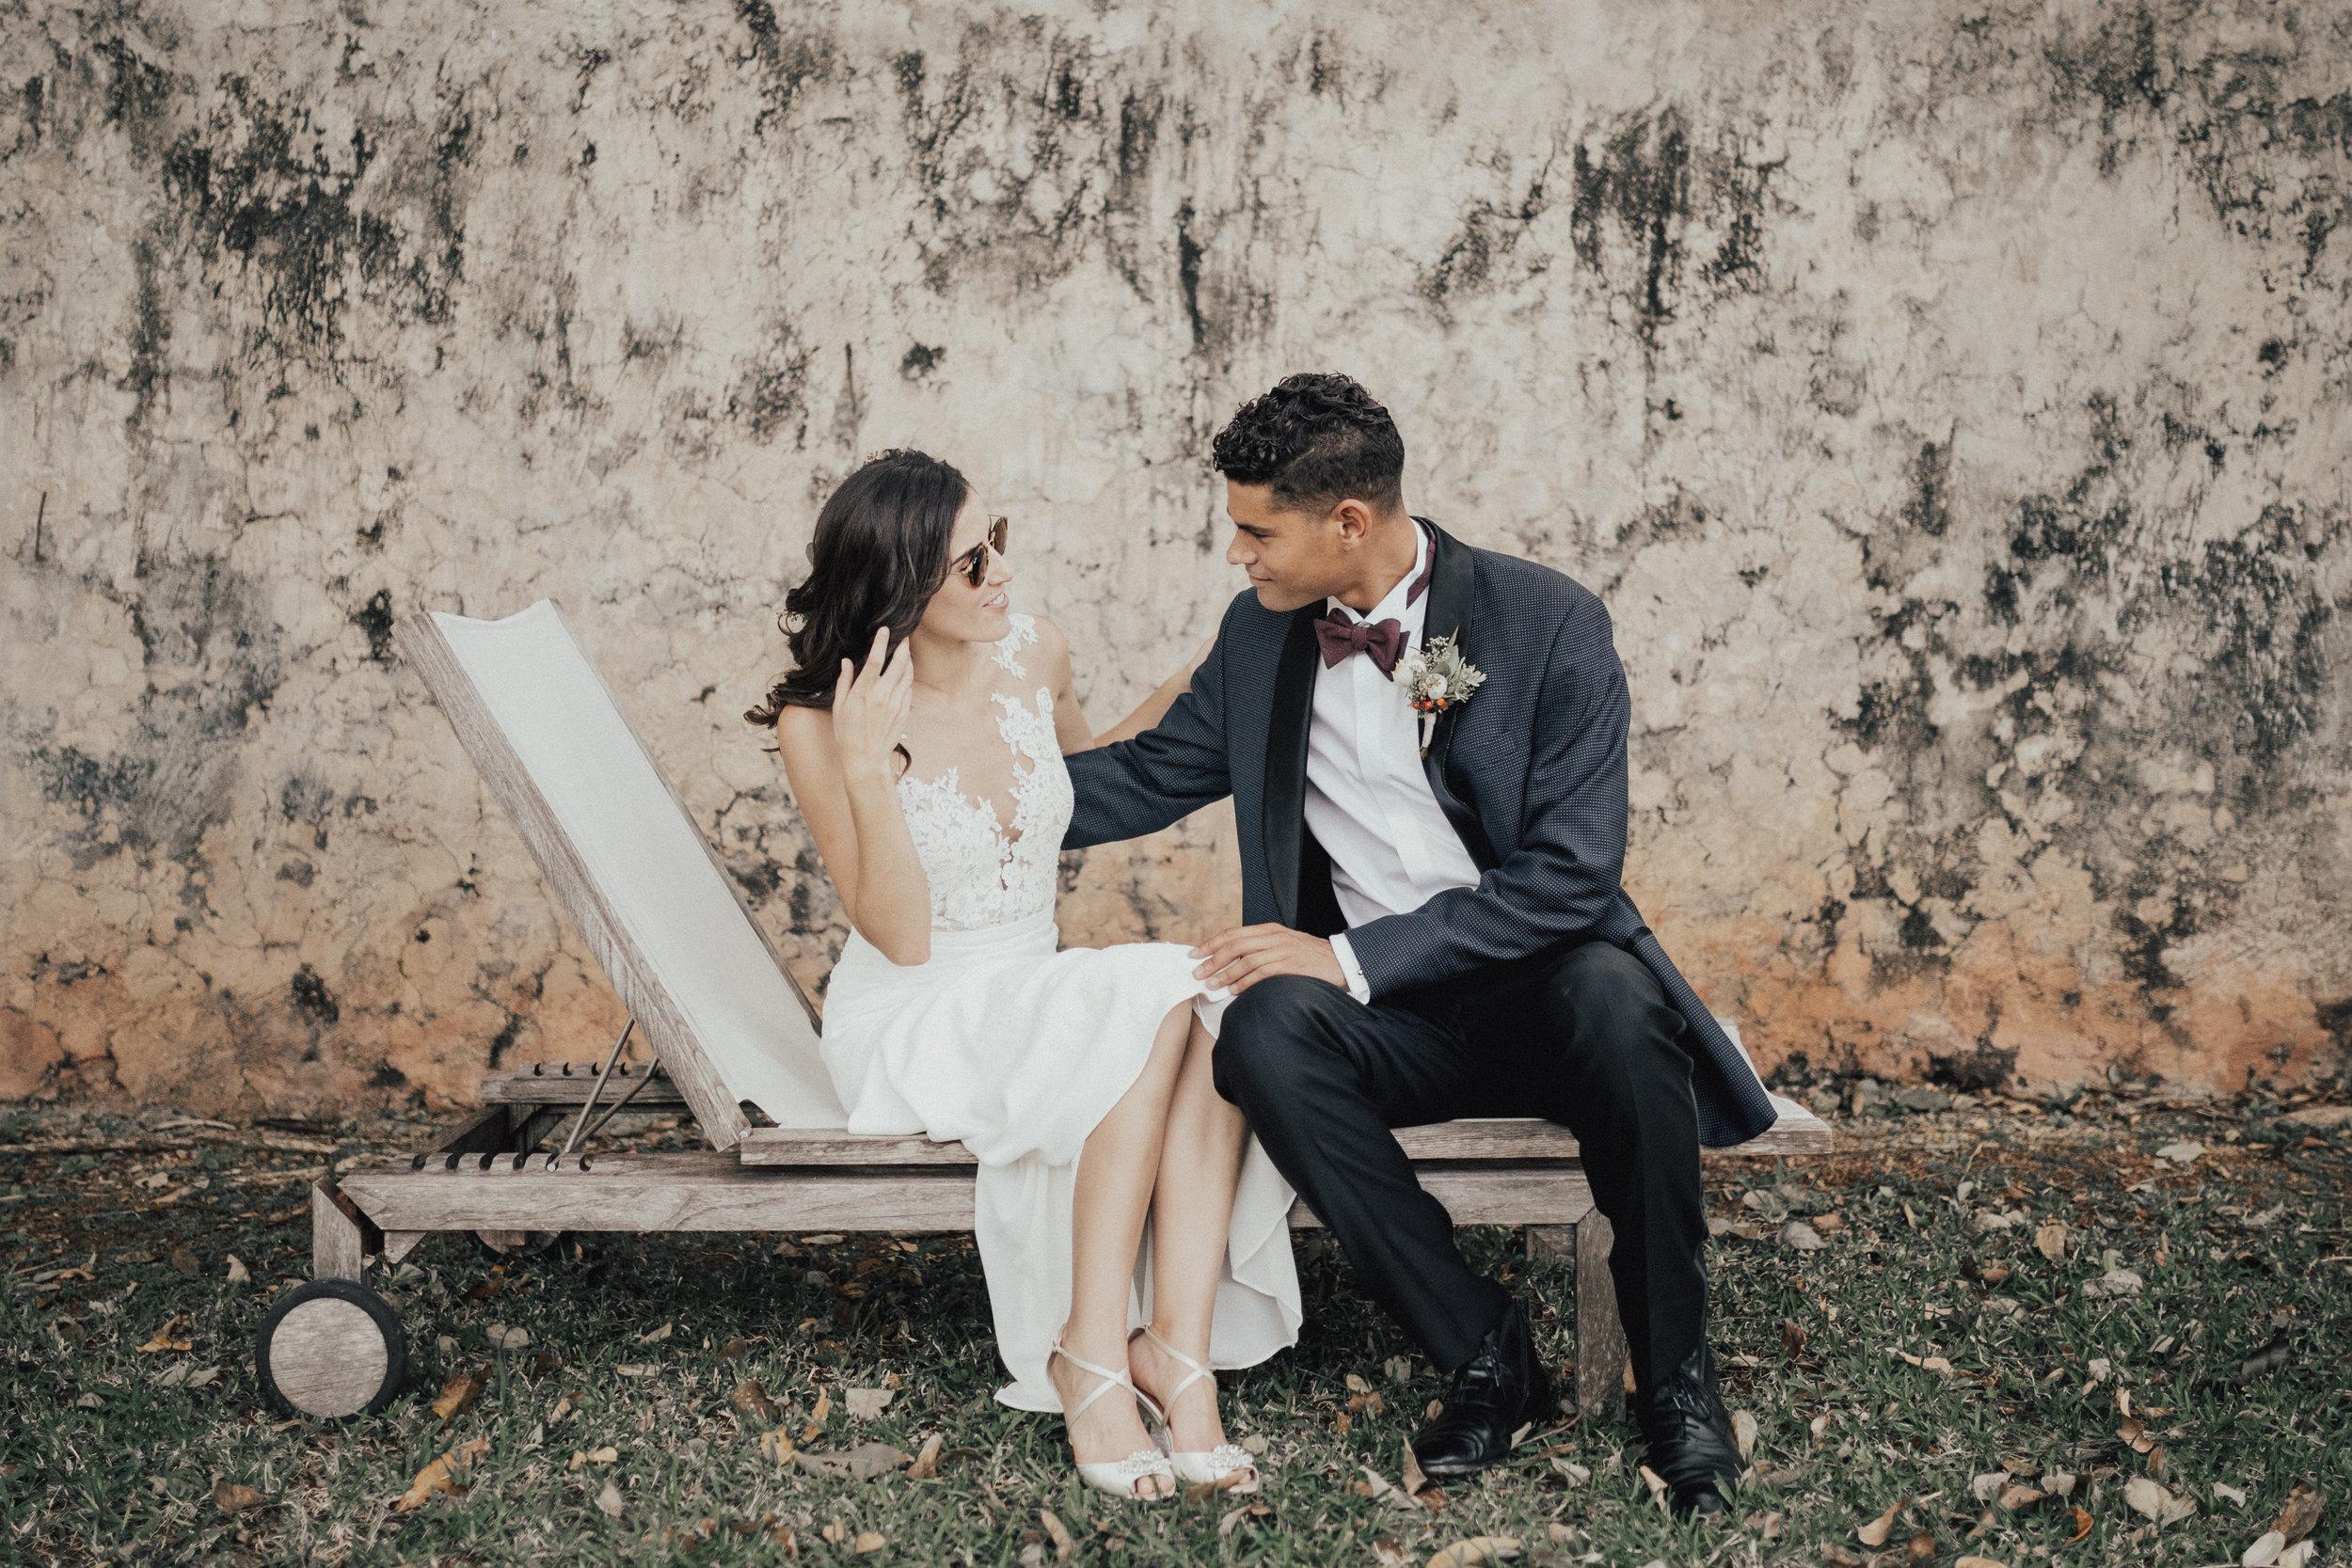 2 first look Tina Kai Merida Mexico Wedding  (80 of 120).jpg